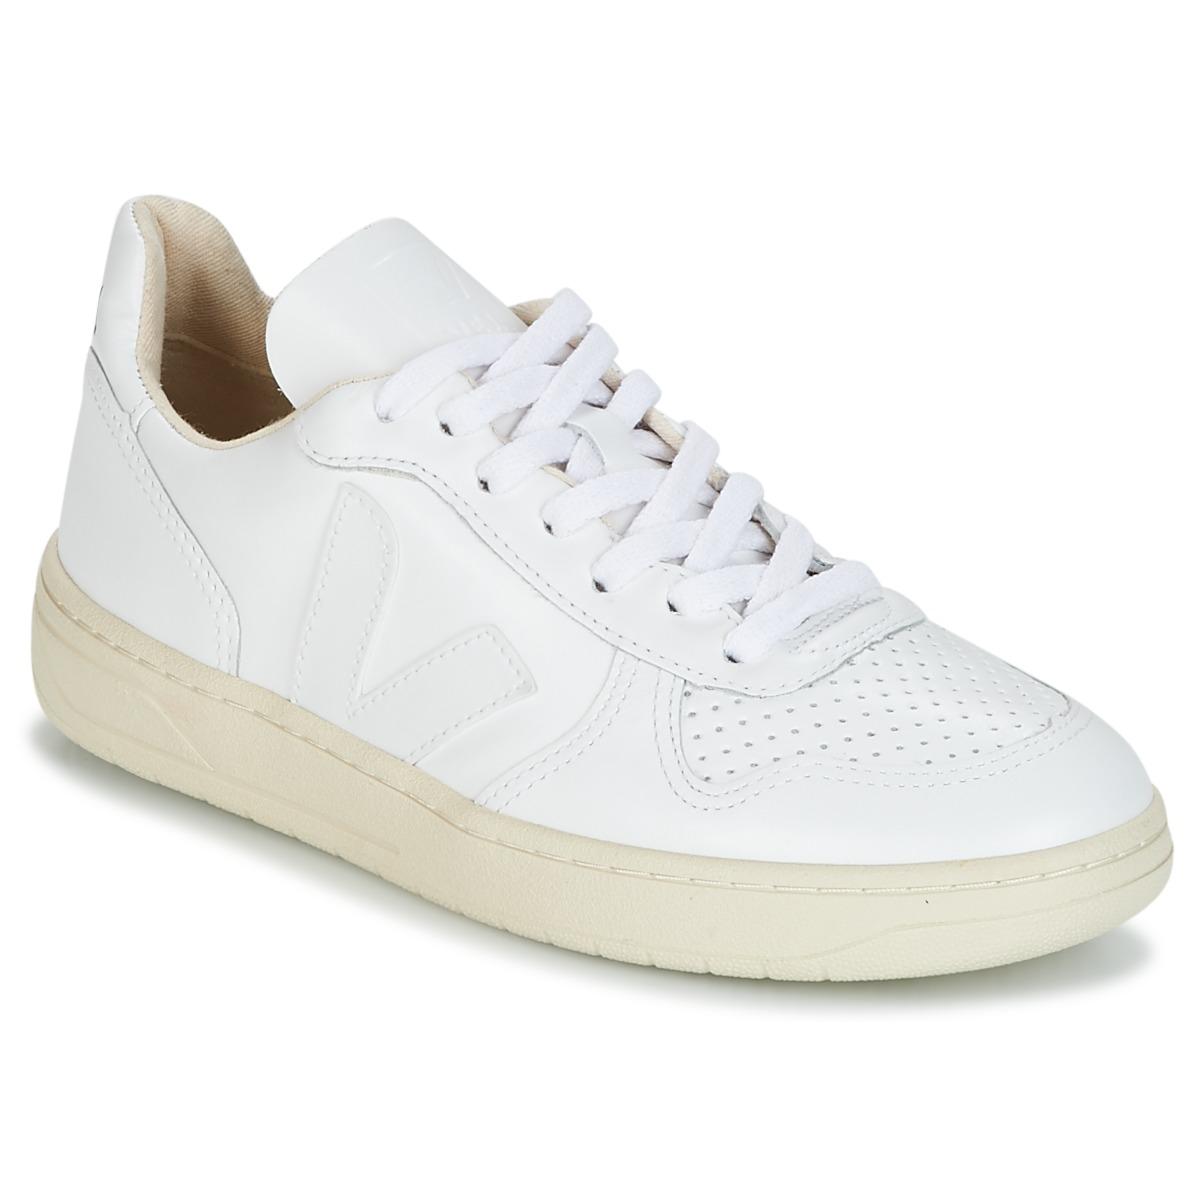 Veja V-10 Weiss - Kostenloser Versand bei Spartoode ! - Schuhe Sneaker Low  100,00 €